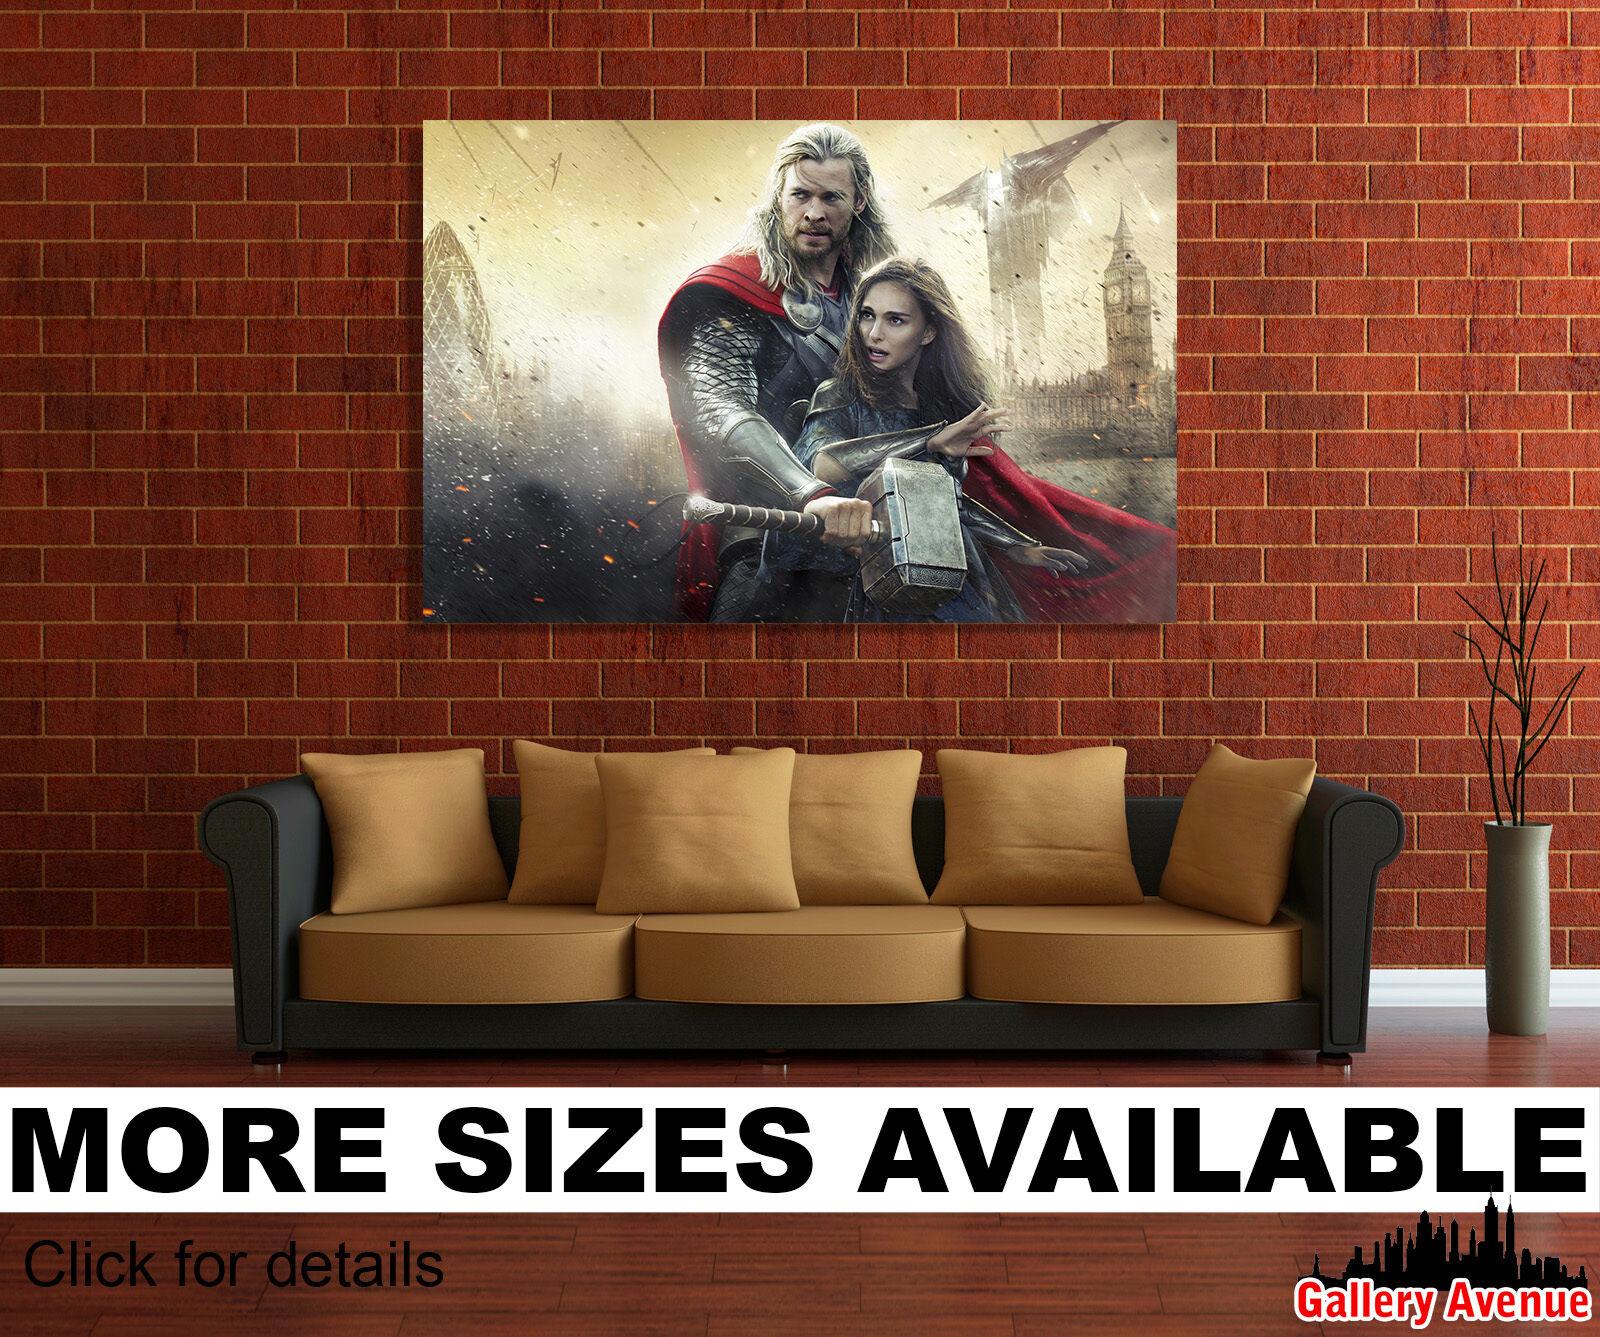 Wall Art Canvas Picture Print - Thor Chris Hemsworth and Natalie Portman 3.2